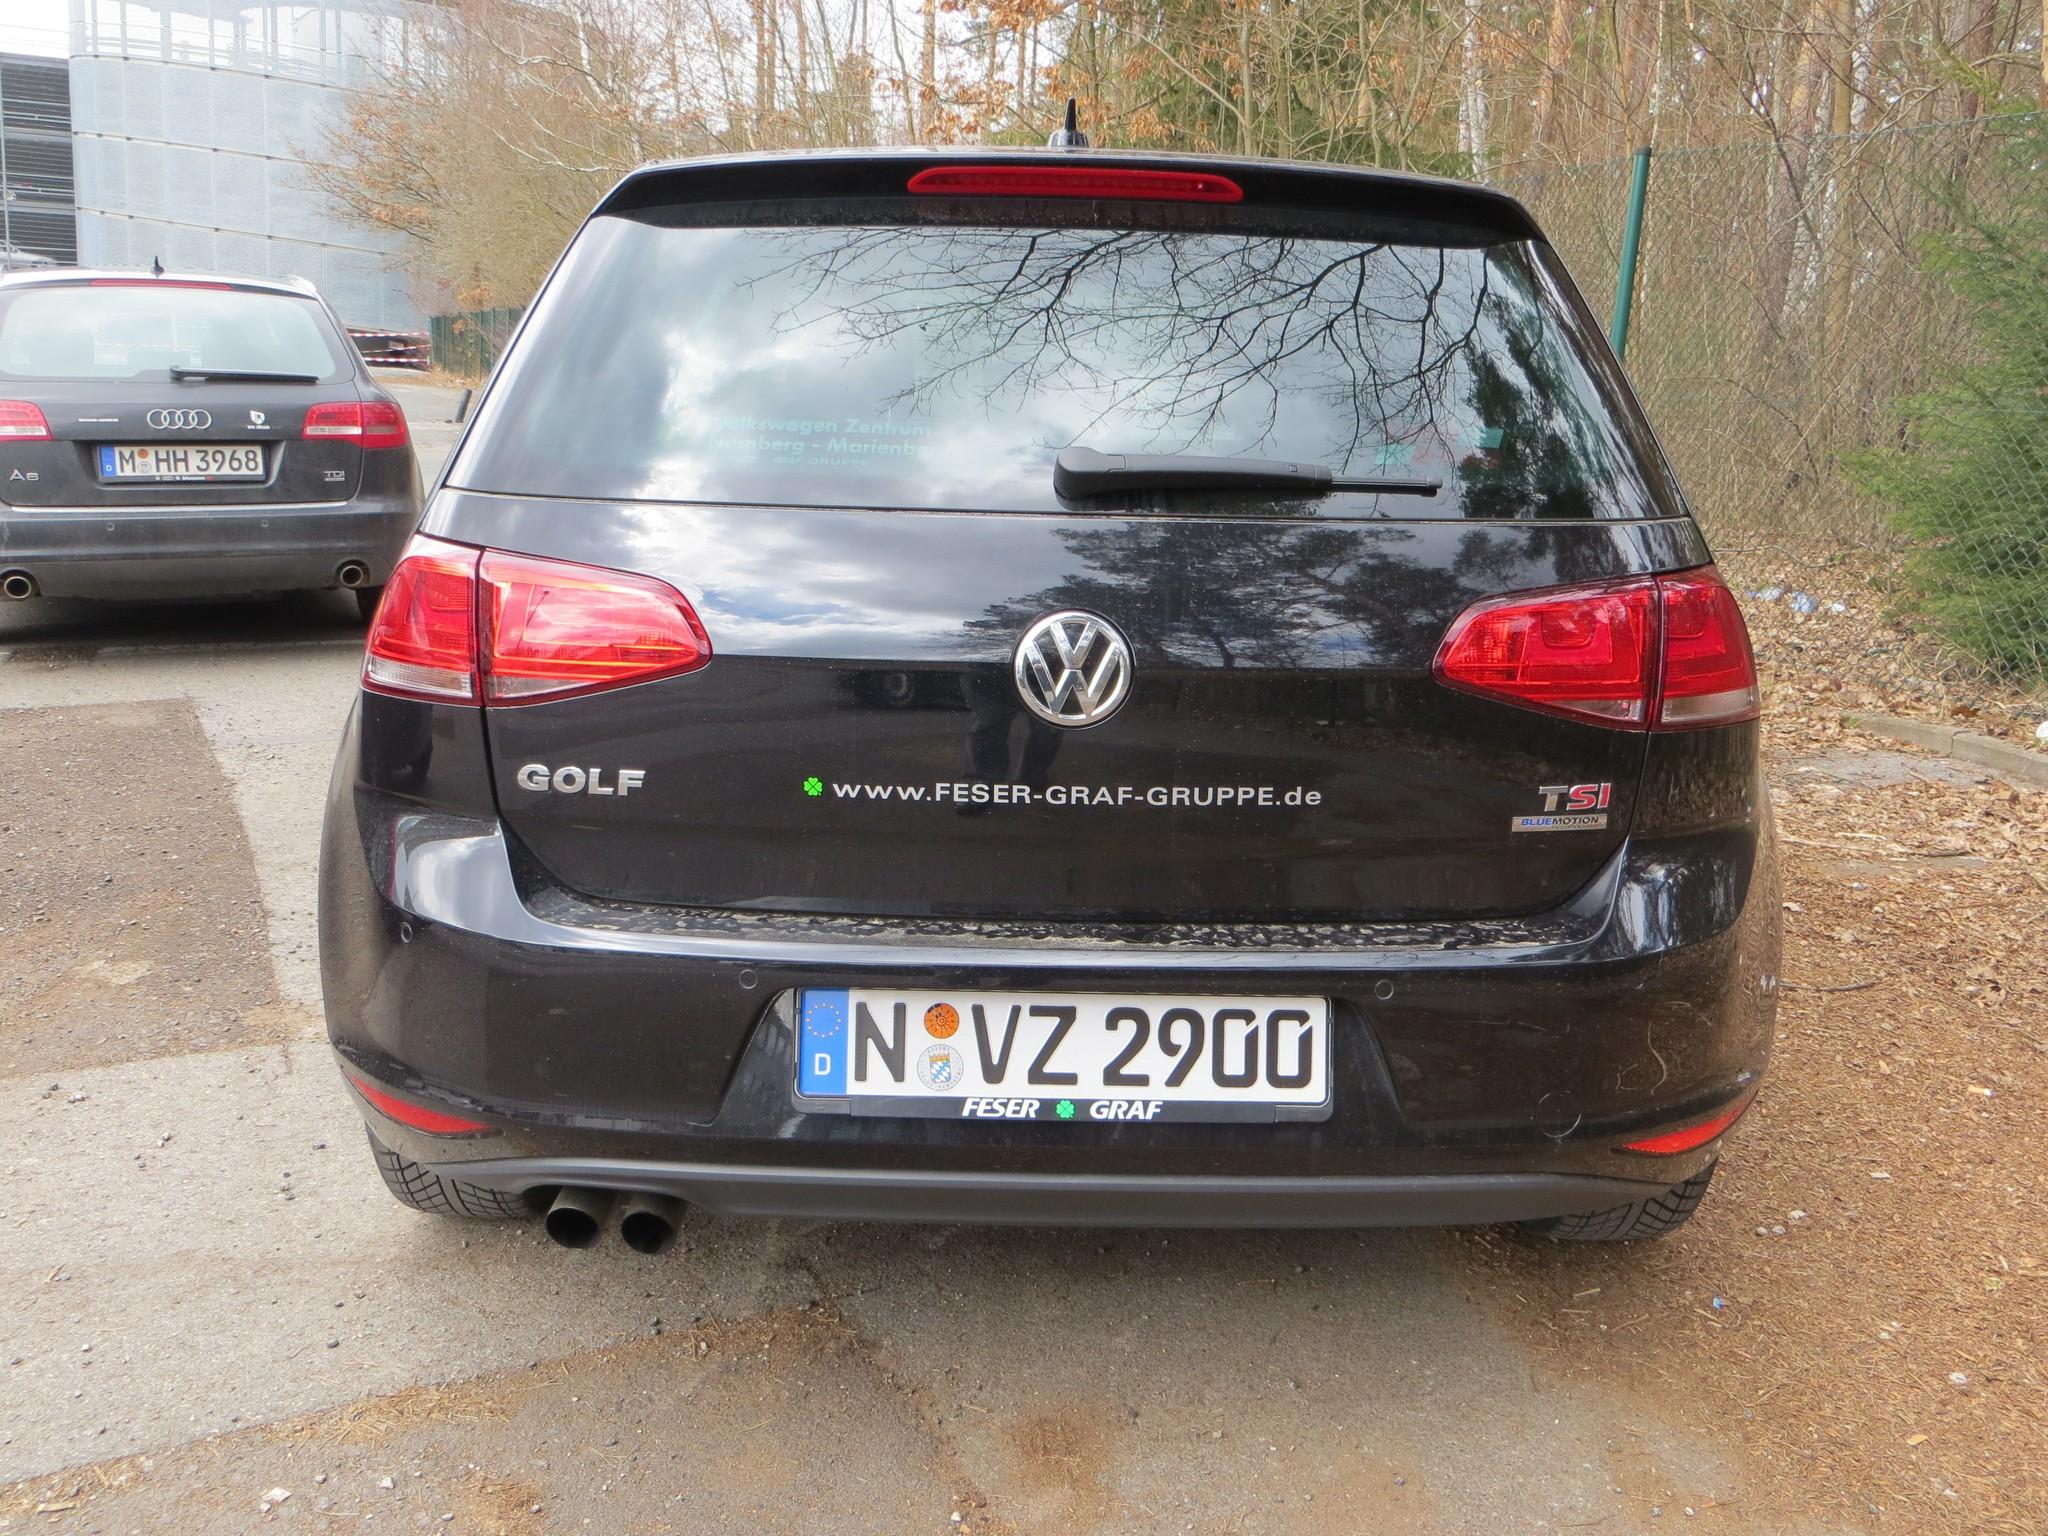 test drive rpt volkswagen golf 7 1 4 tsi 140 act bluemotion dsg7 2013 auto titre. Black Bedroom Furniture Sets. Home Design Ideas